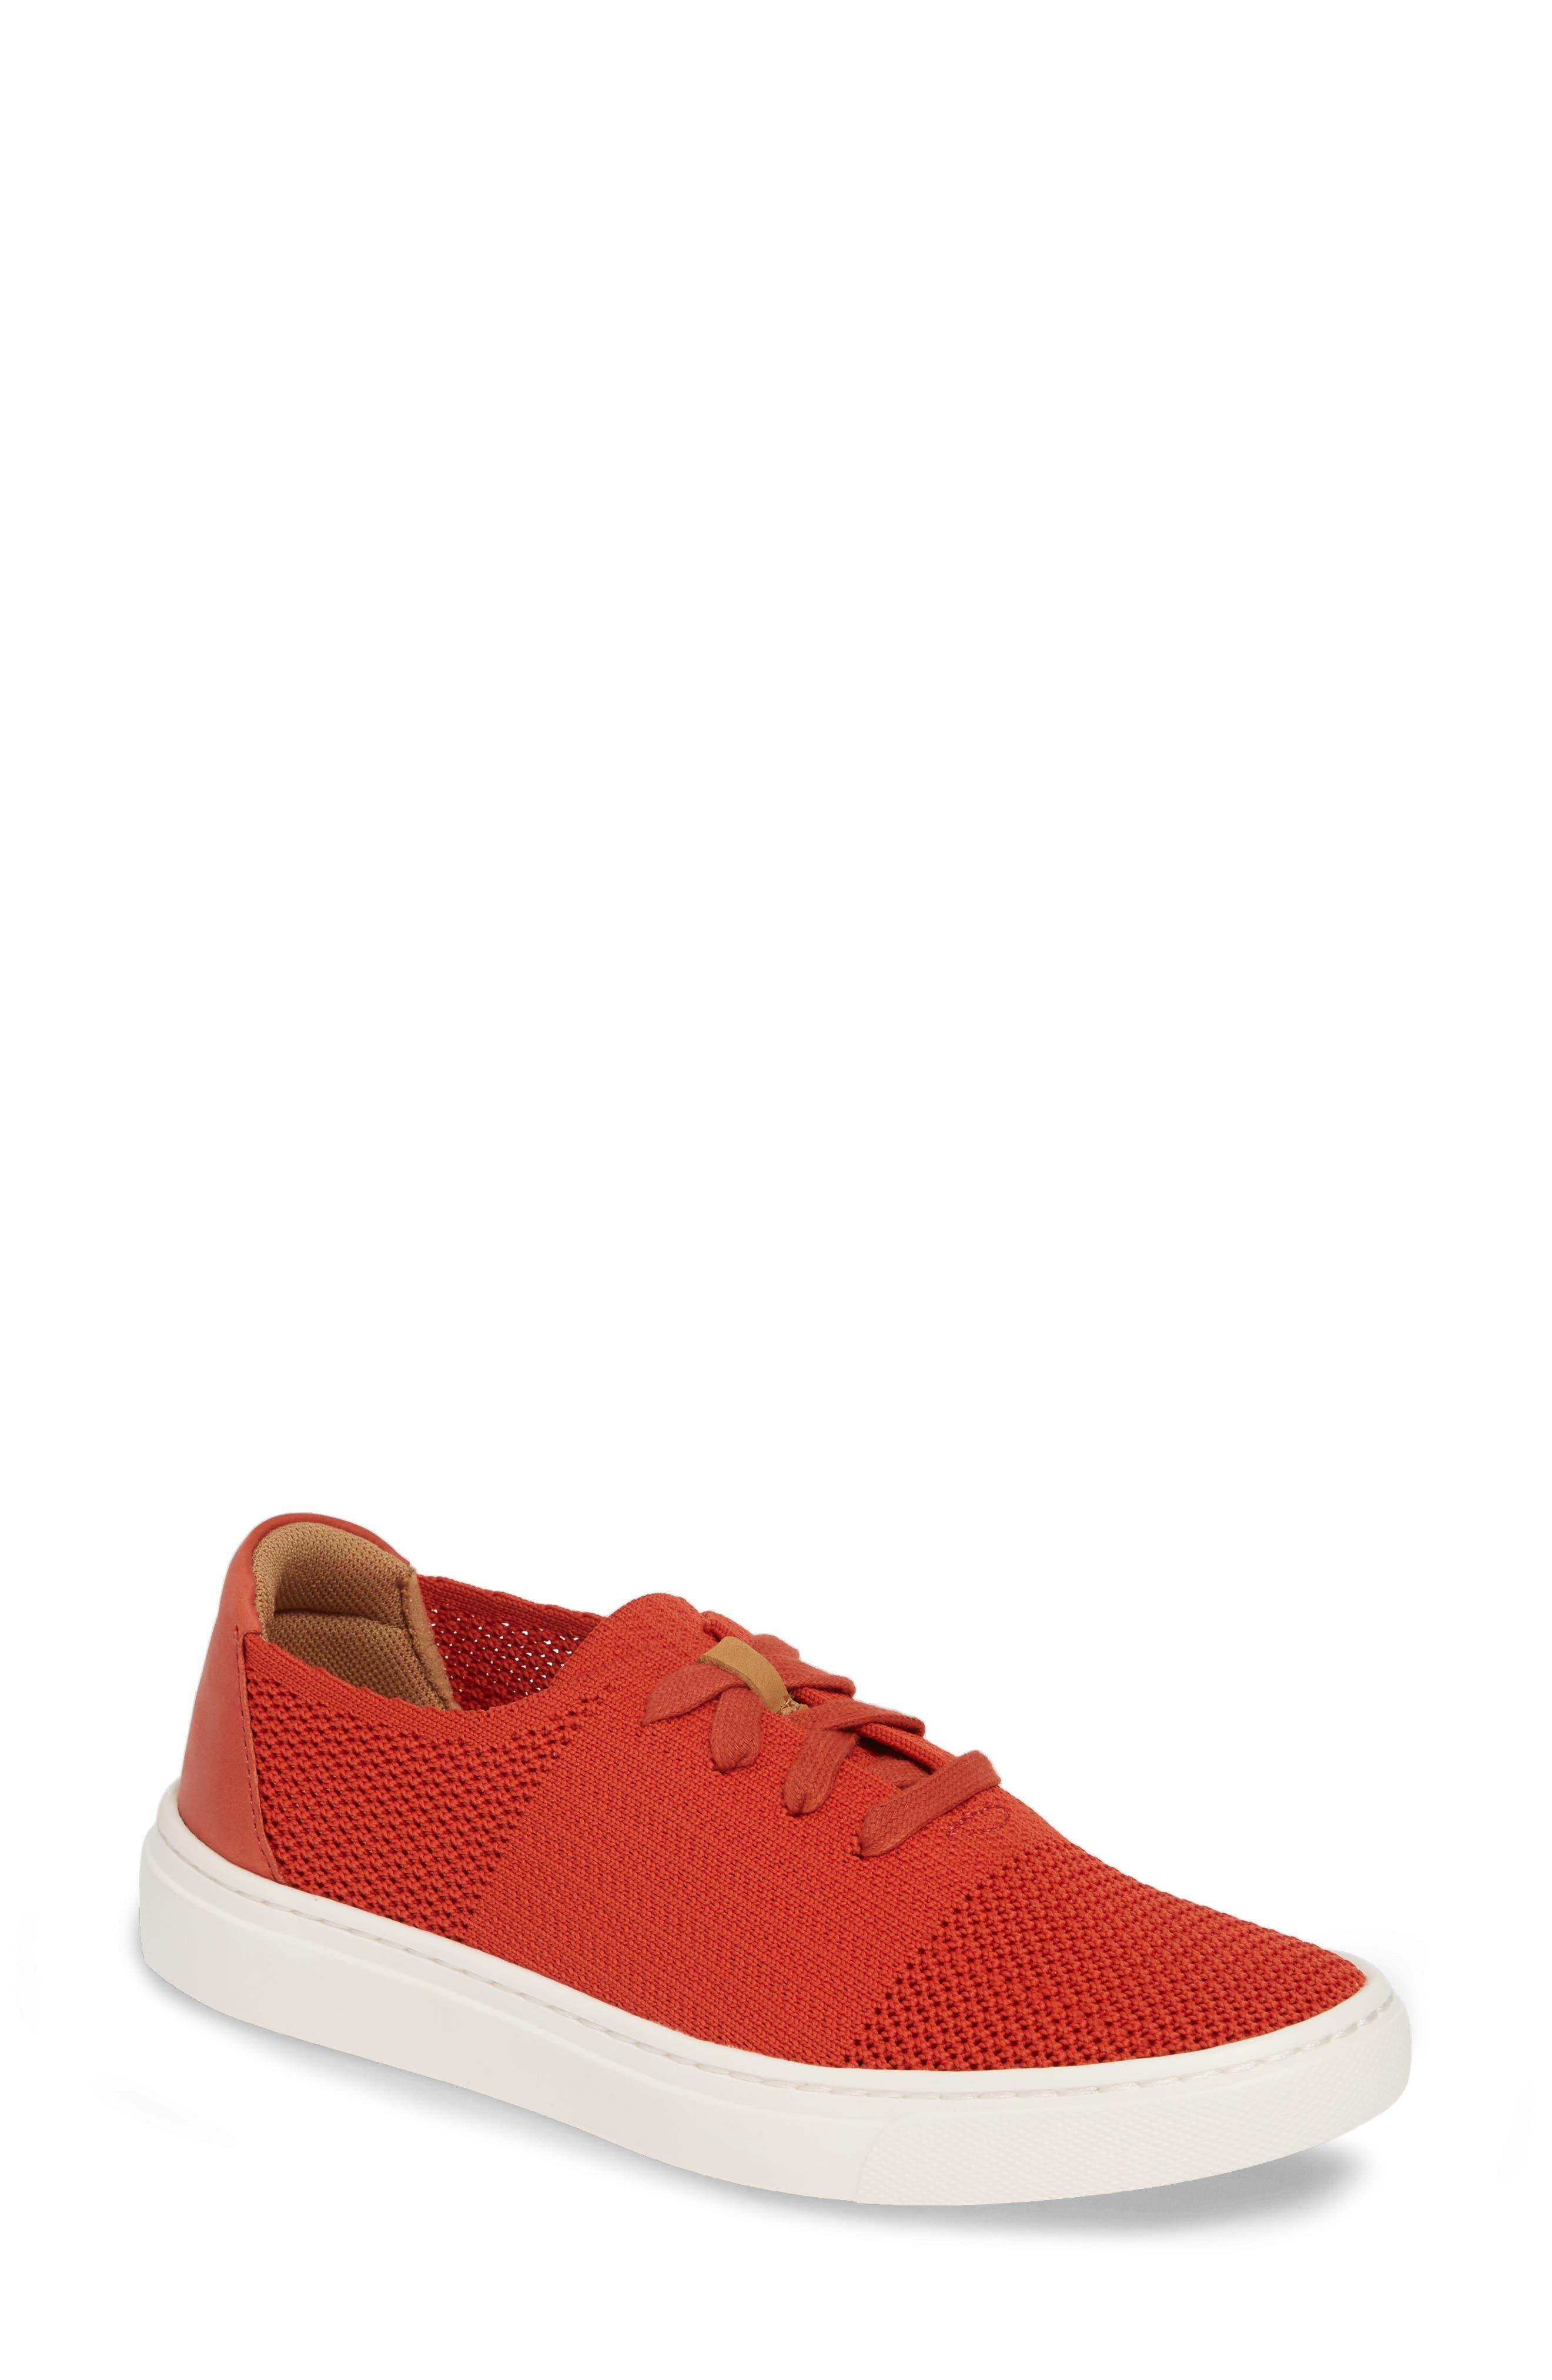 Trista Sneaker